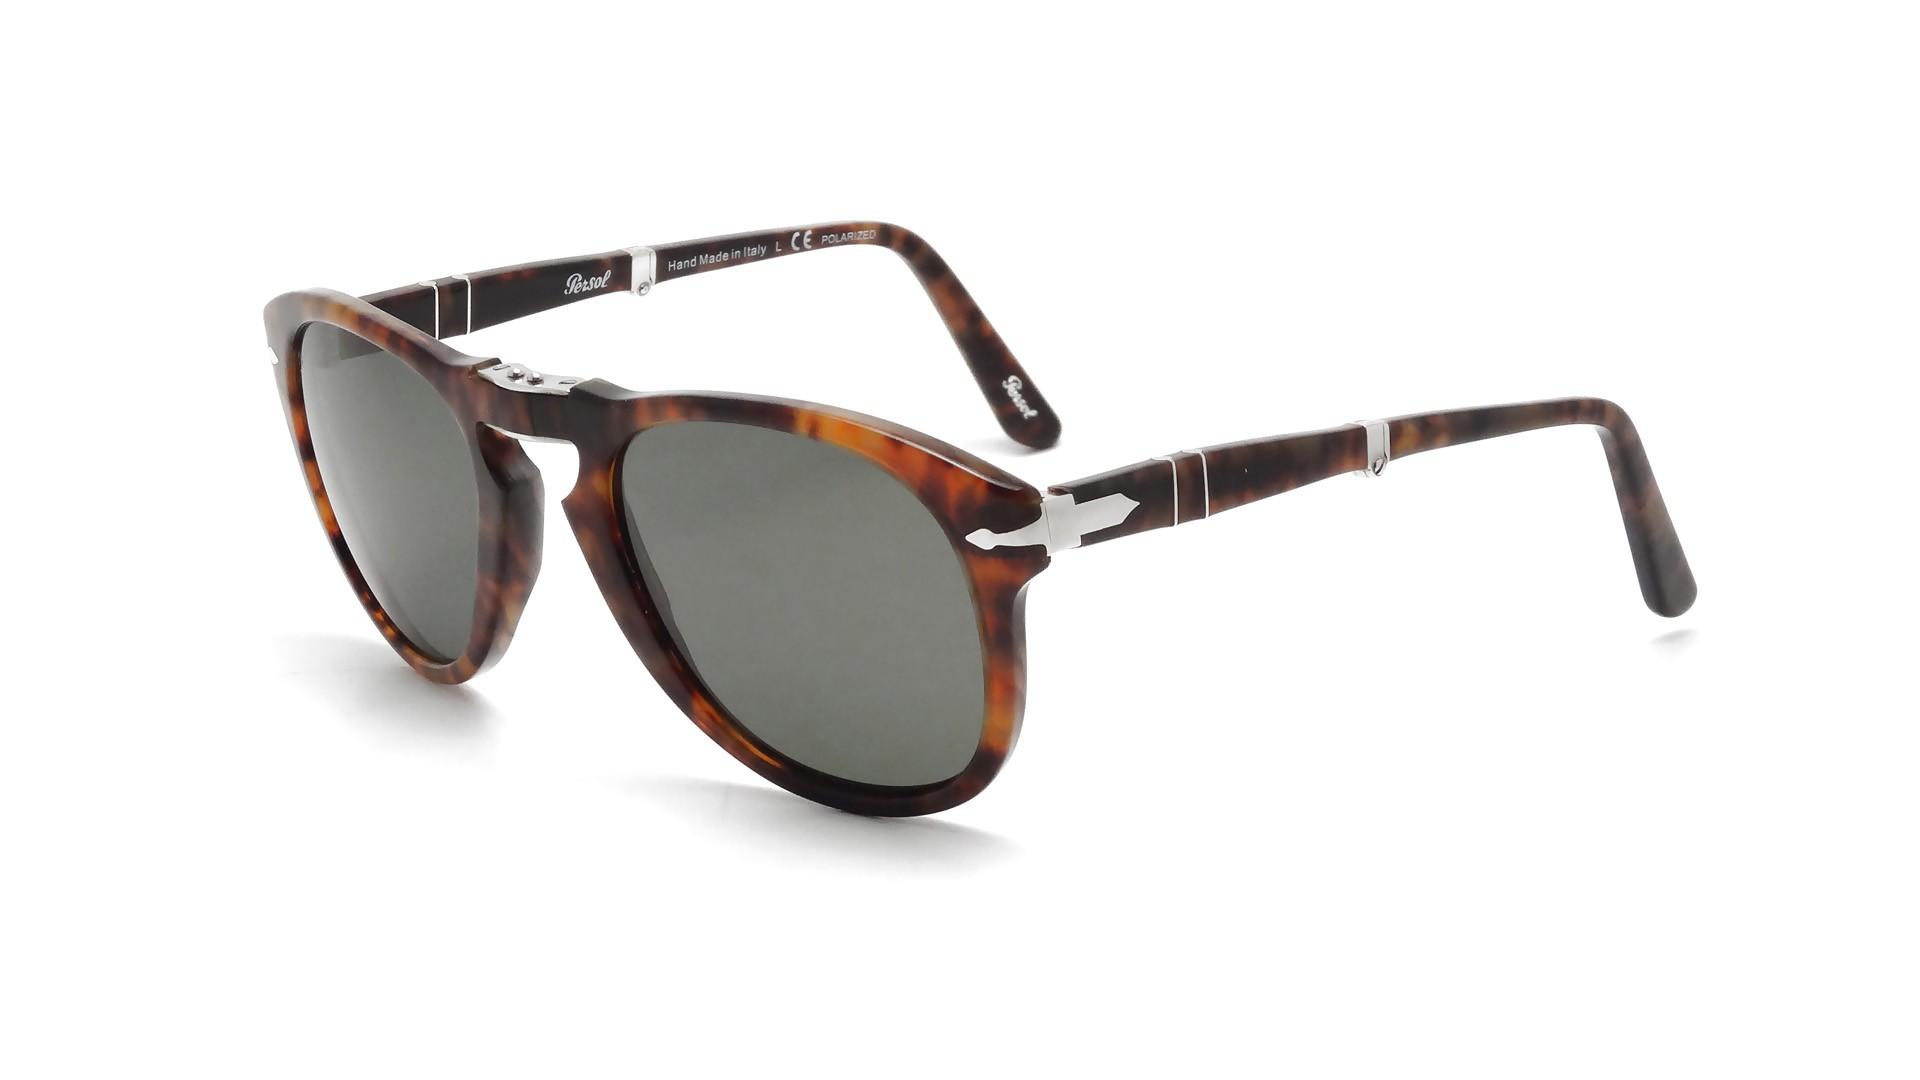 96938390248 Sunglasses Persol PO0714 108 58 52-20 Tortoise Medium Pliantes Polarized  Gradient